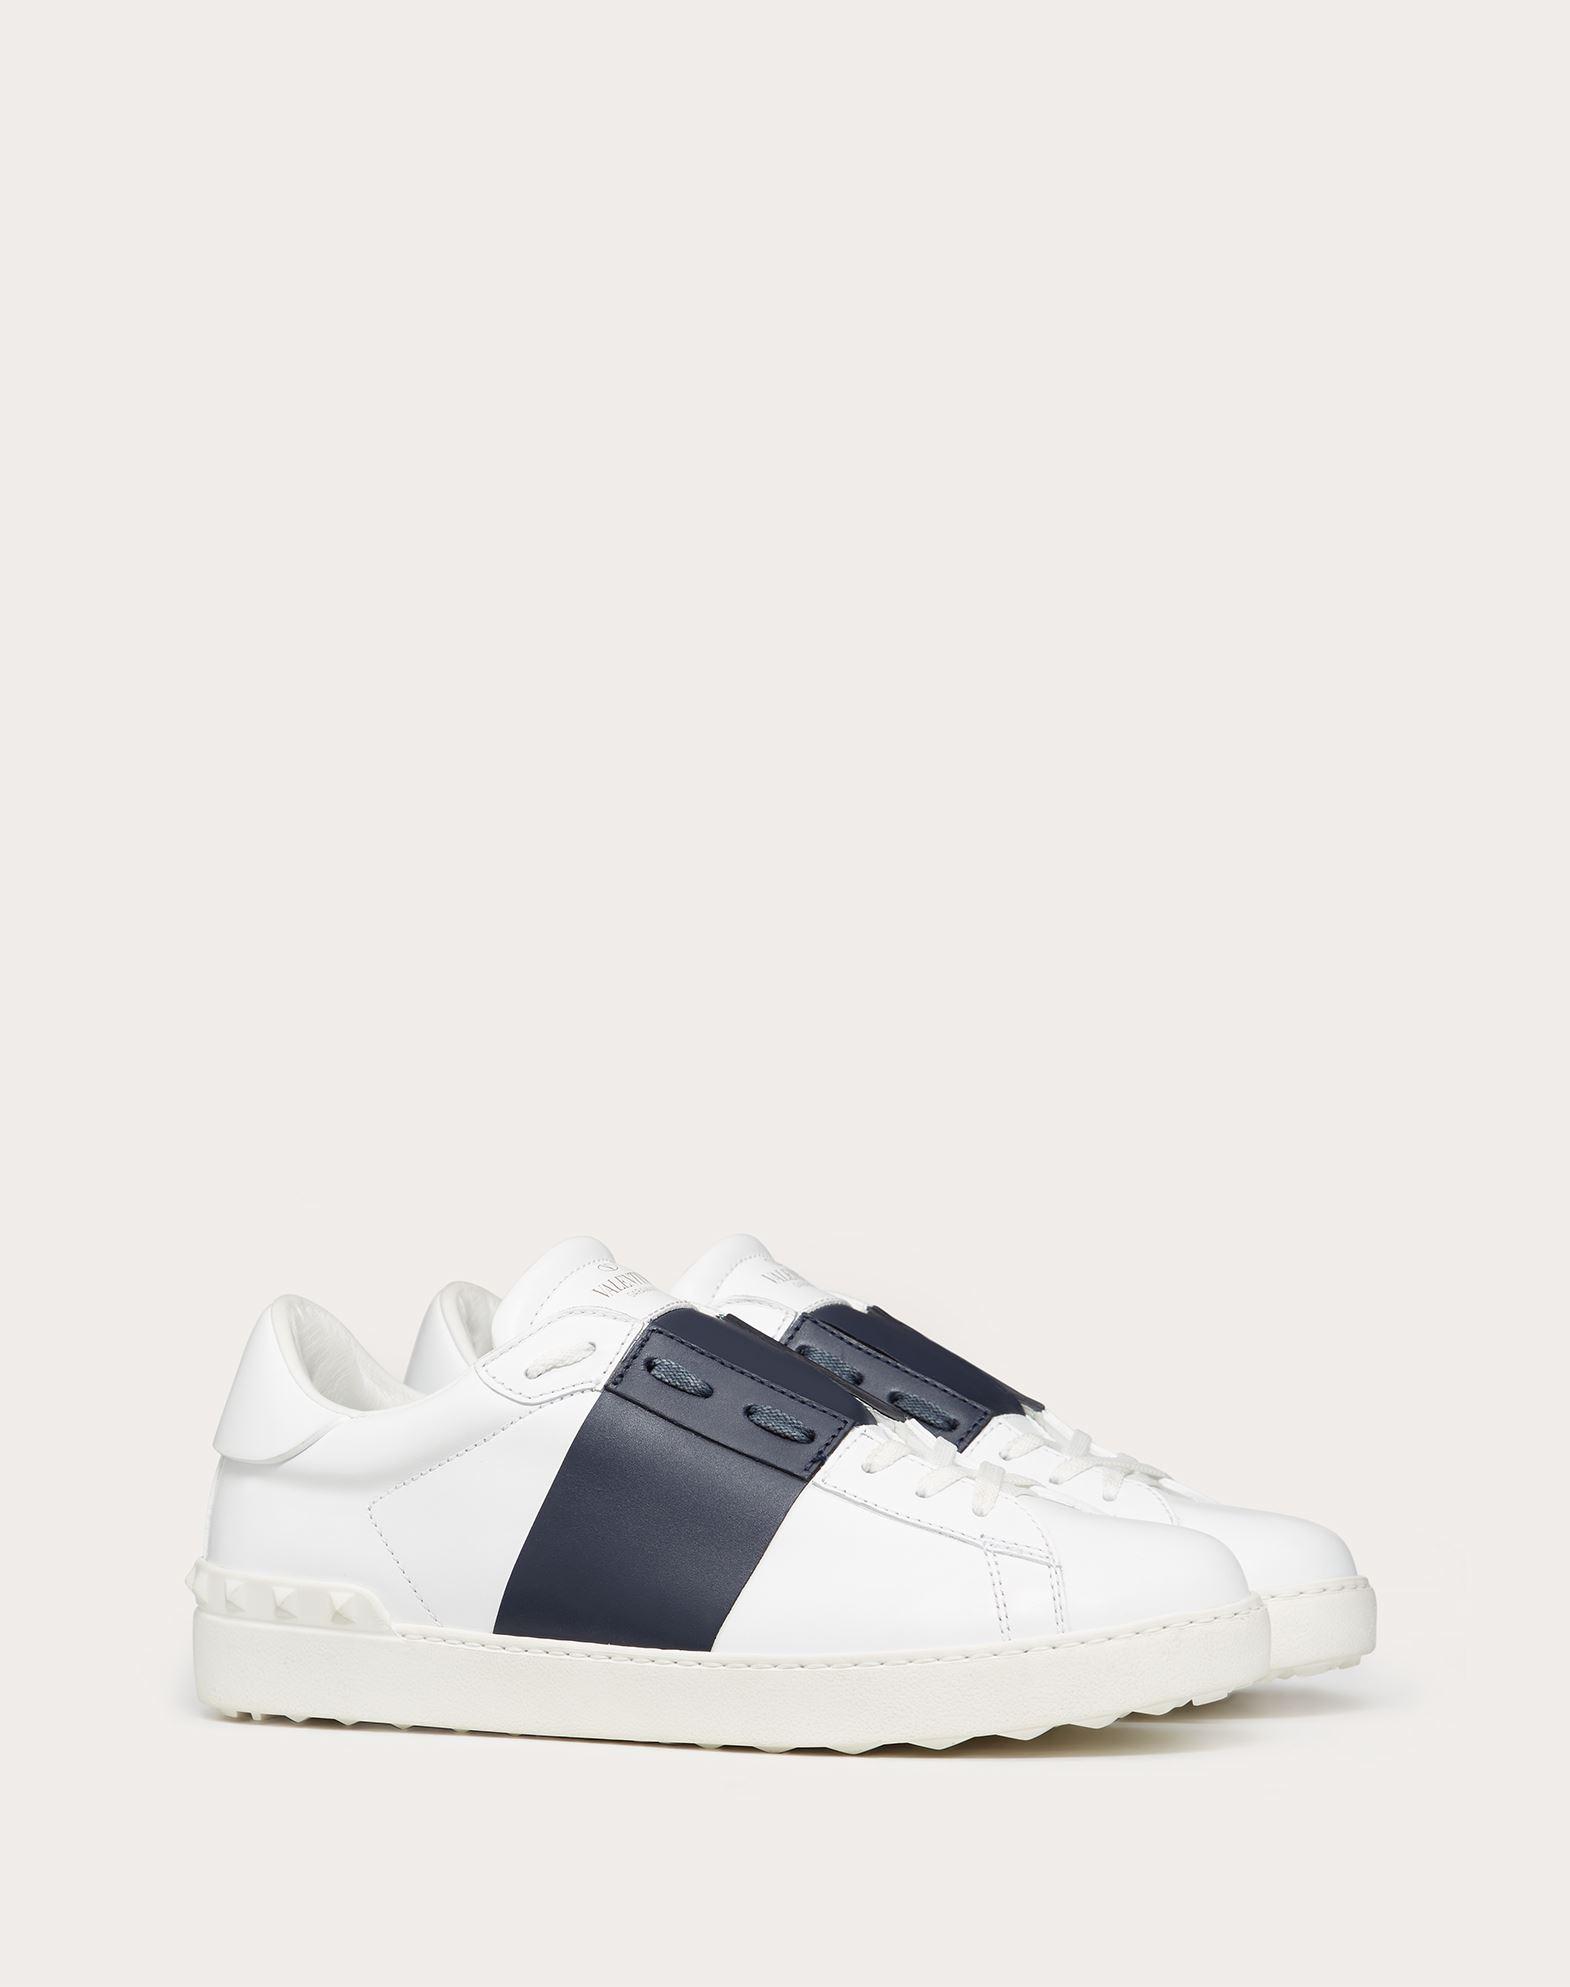 VALENTINO GARAVANI UOMO Open Sneaker LOW-TOP SNEAKERS U r